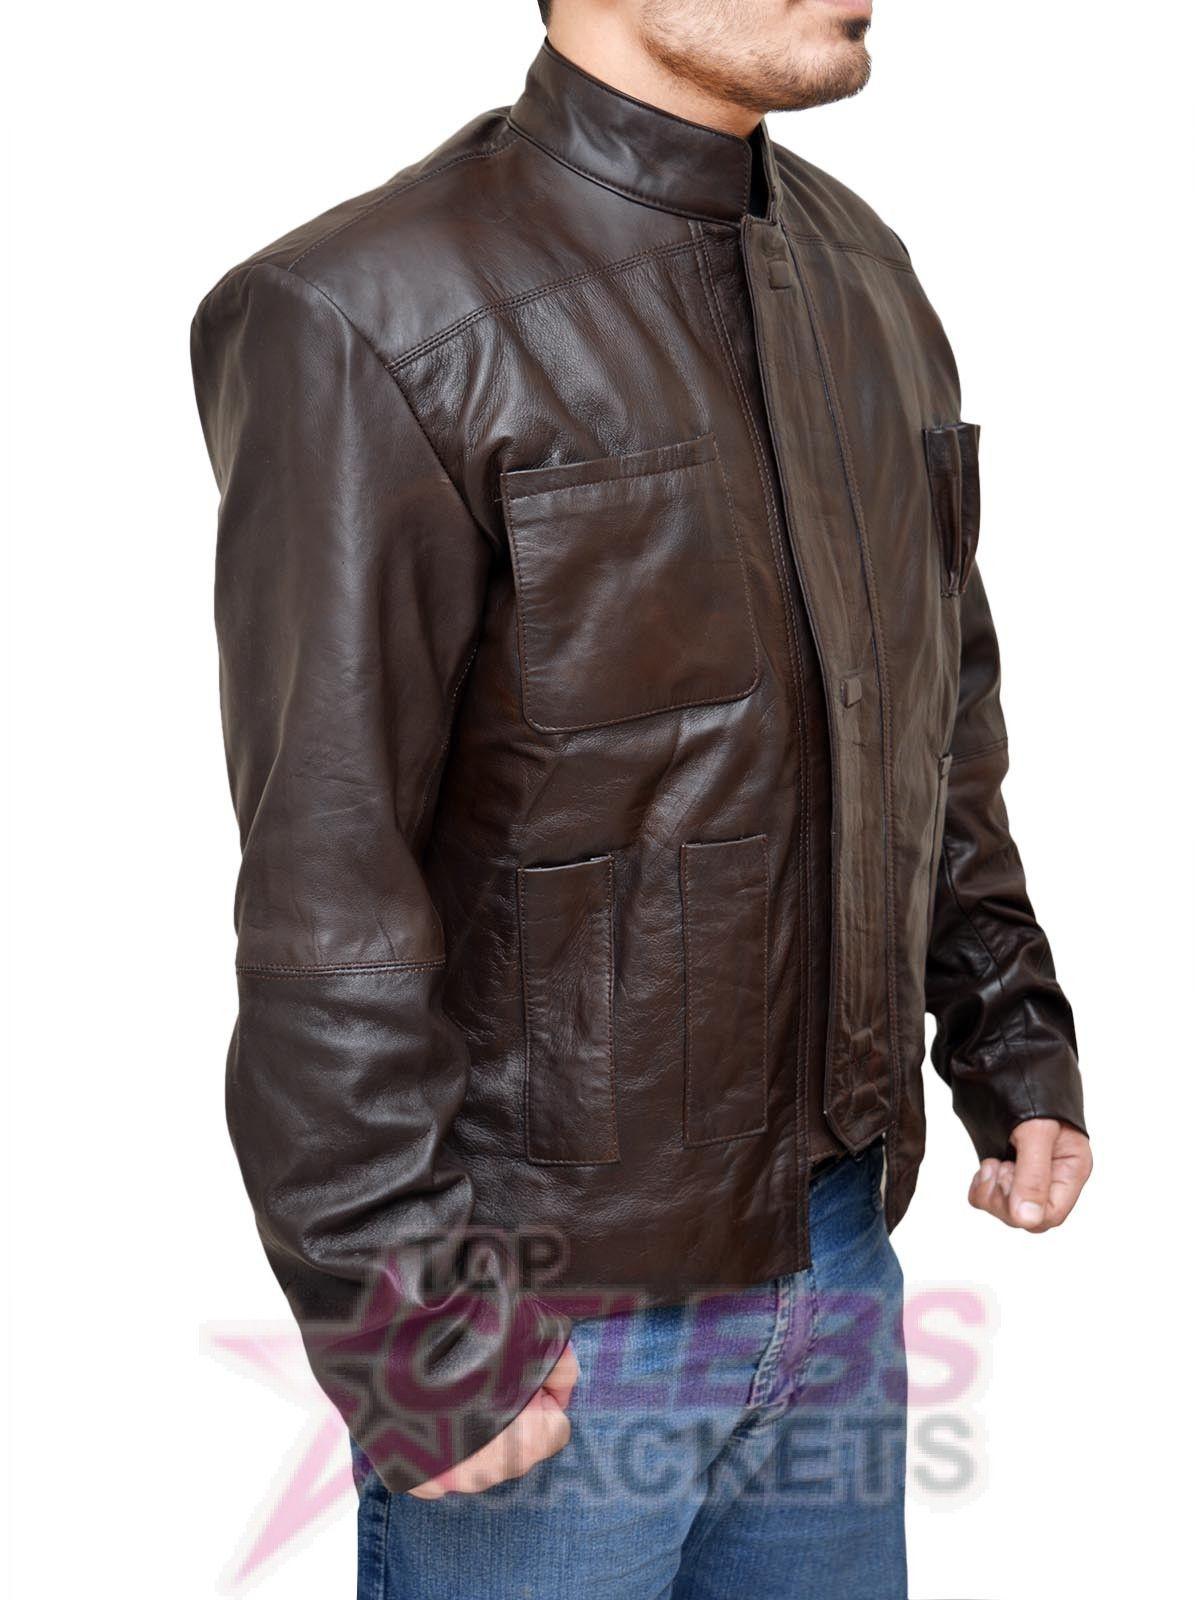 Star Wars Force Awakens Harrison Ford Jacket Top Celebs Jackets Jackets Celebrity Jackets Jacket Tops [ 1600 x 1200 Pixel ]